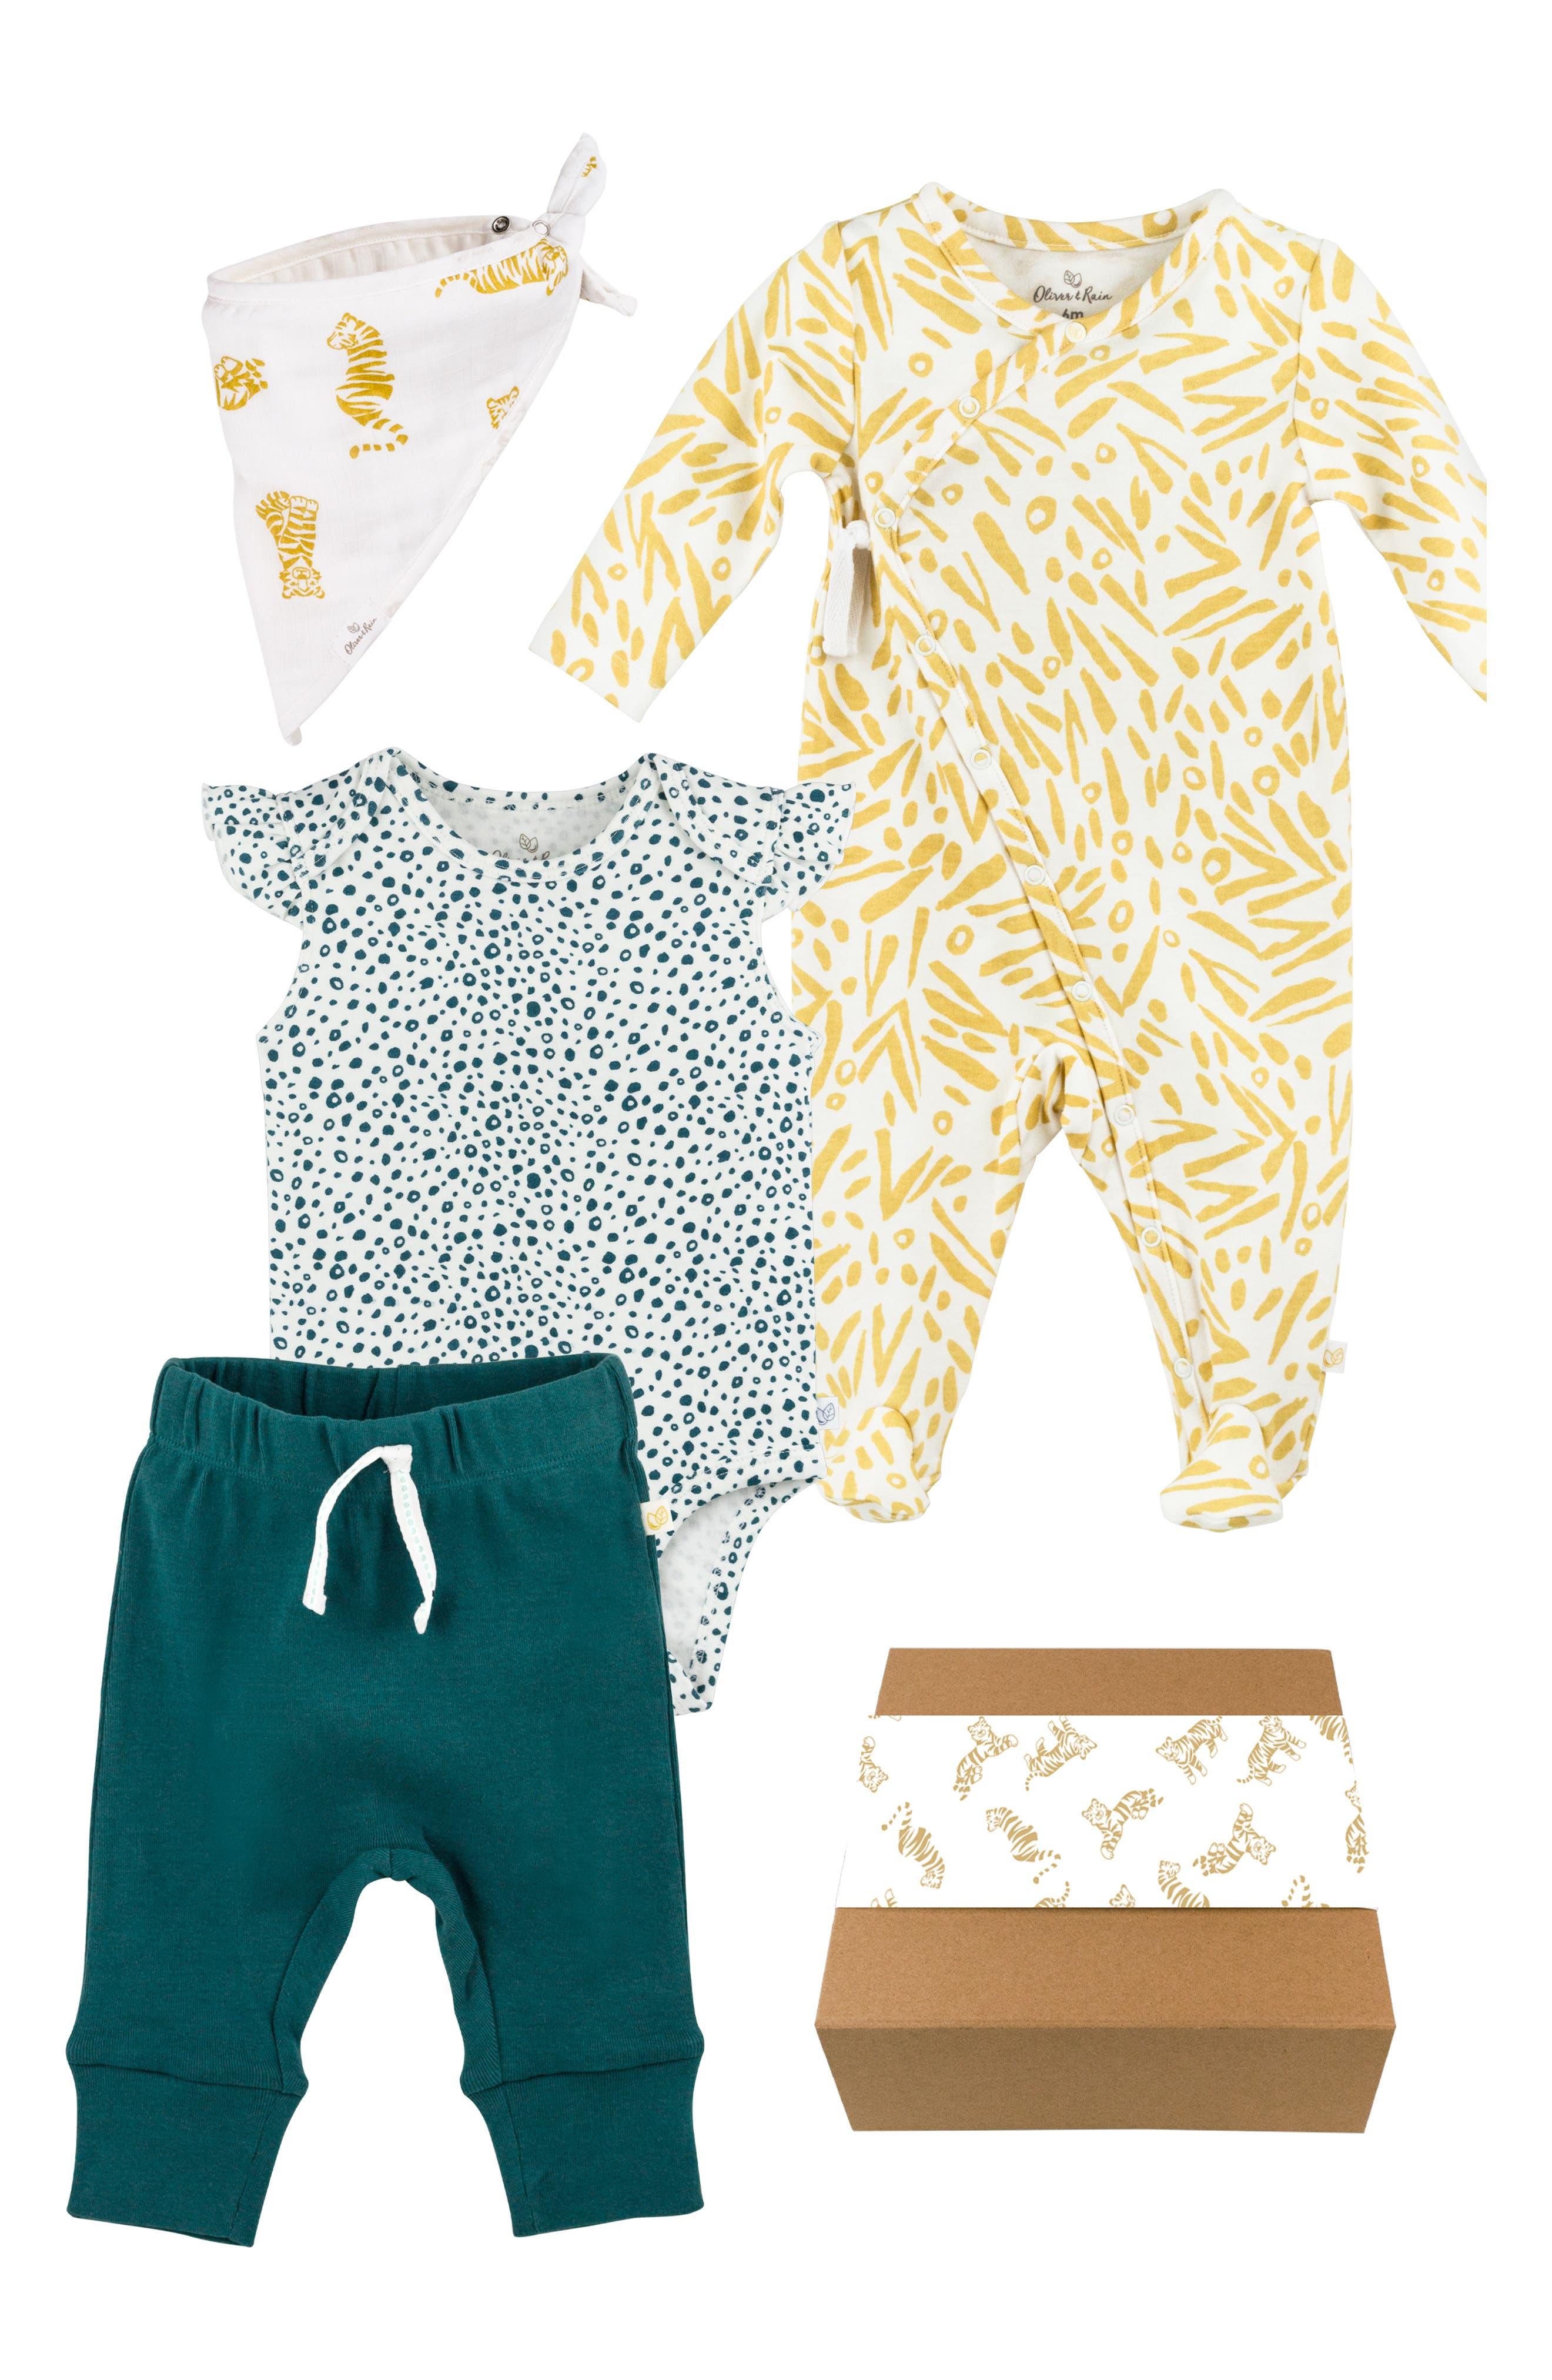 Organic Cotton Bandana Bib, Bodysuit, Sweatpants & Footie Gift Set, Main, color, 810